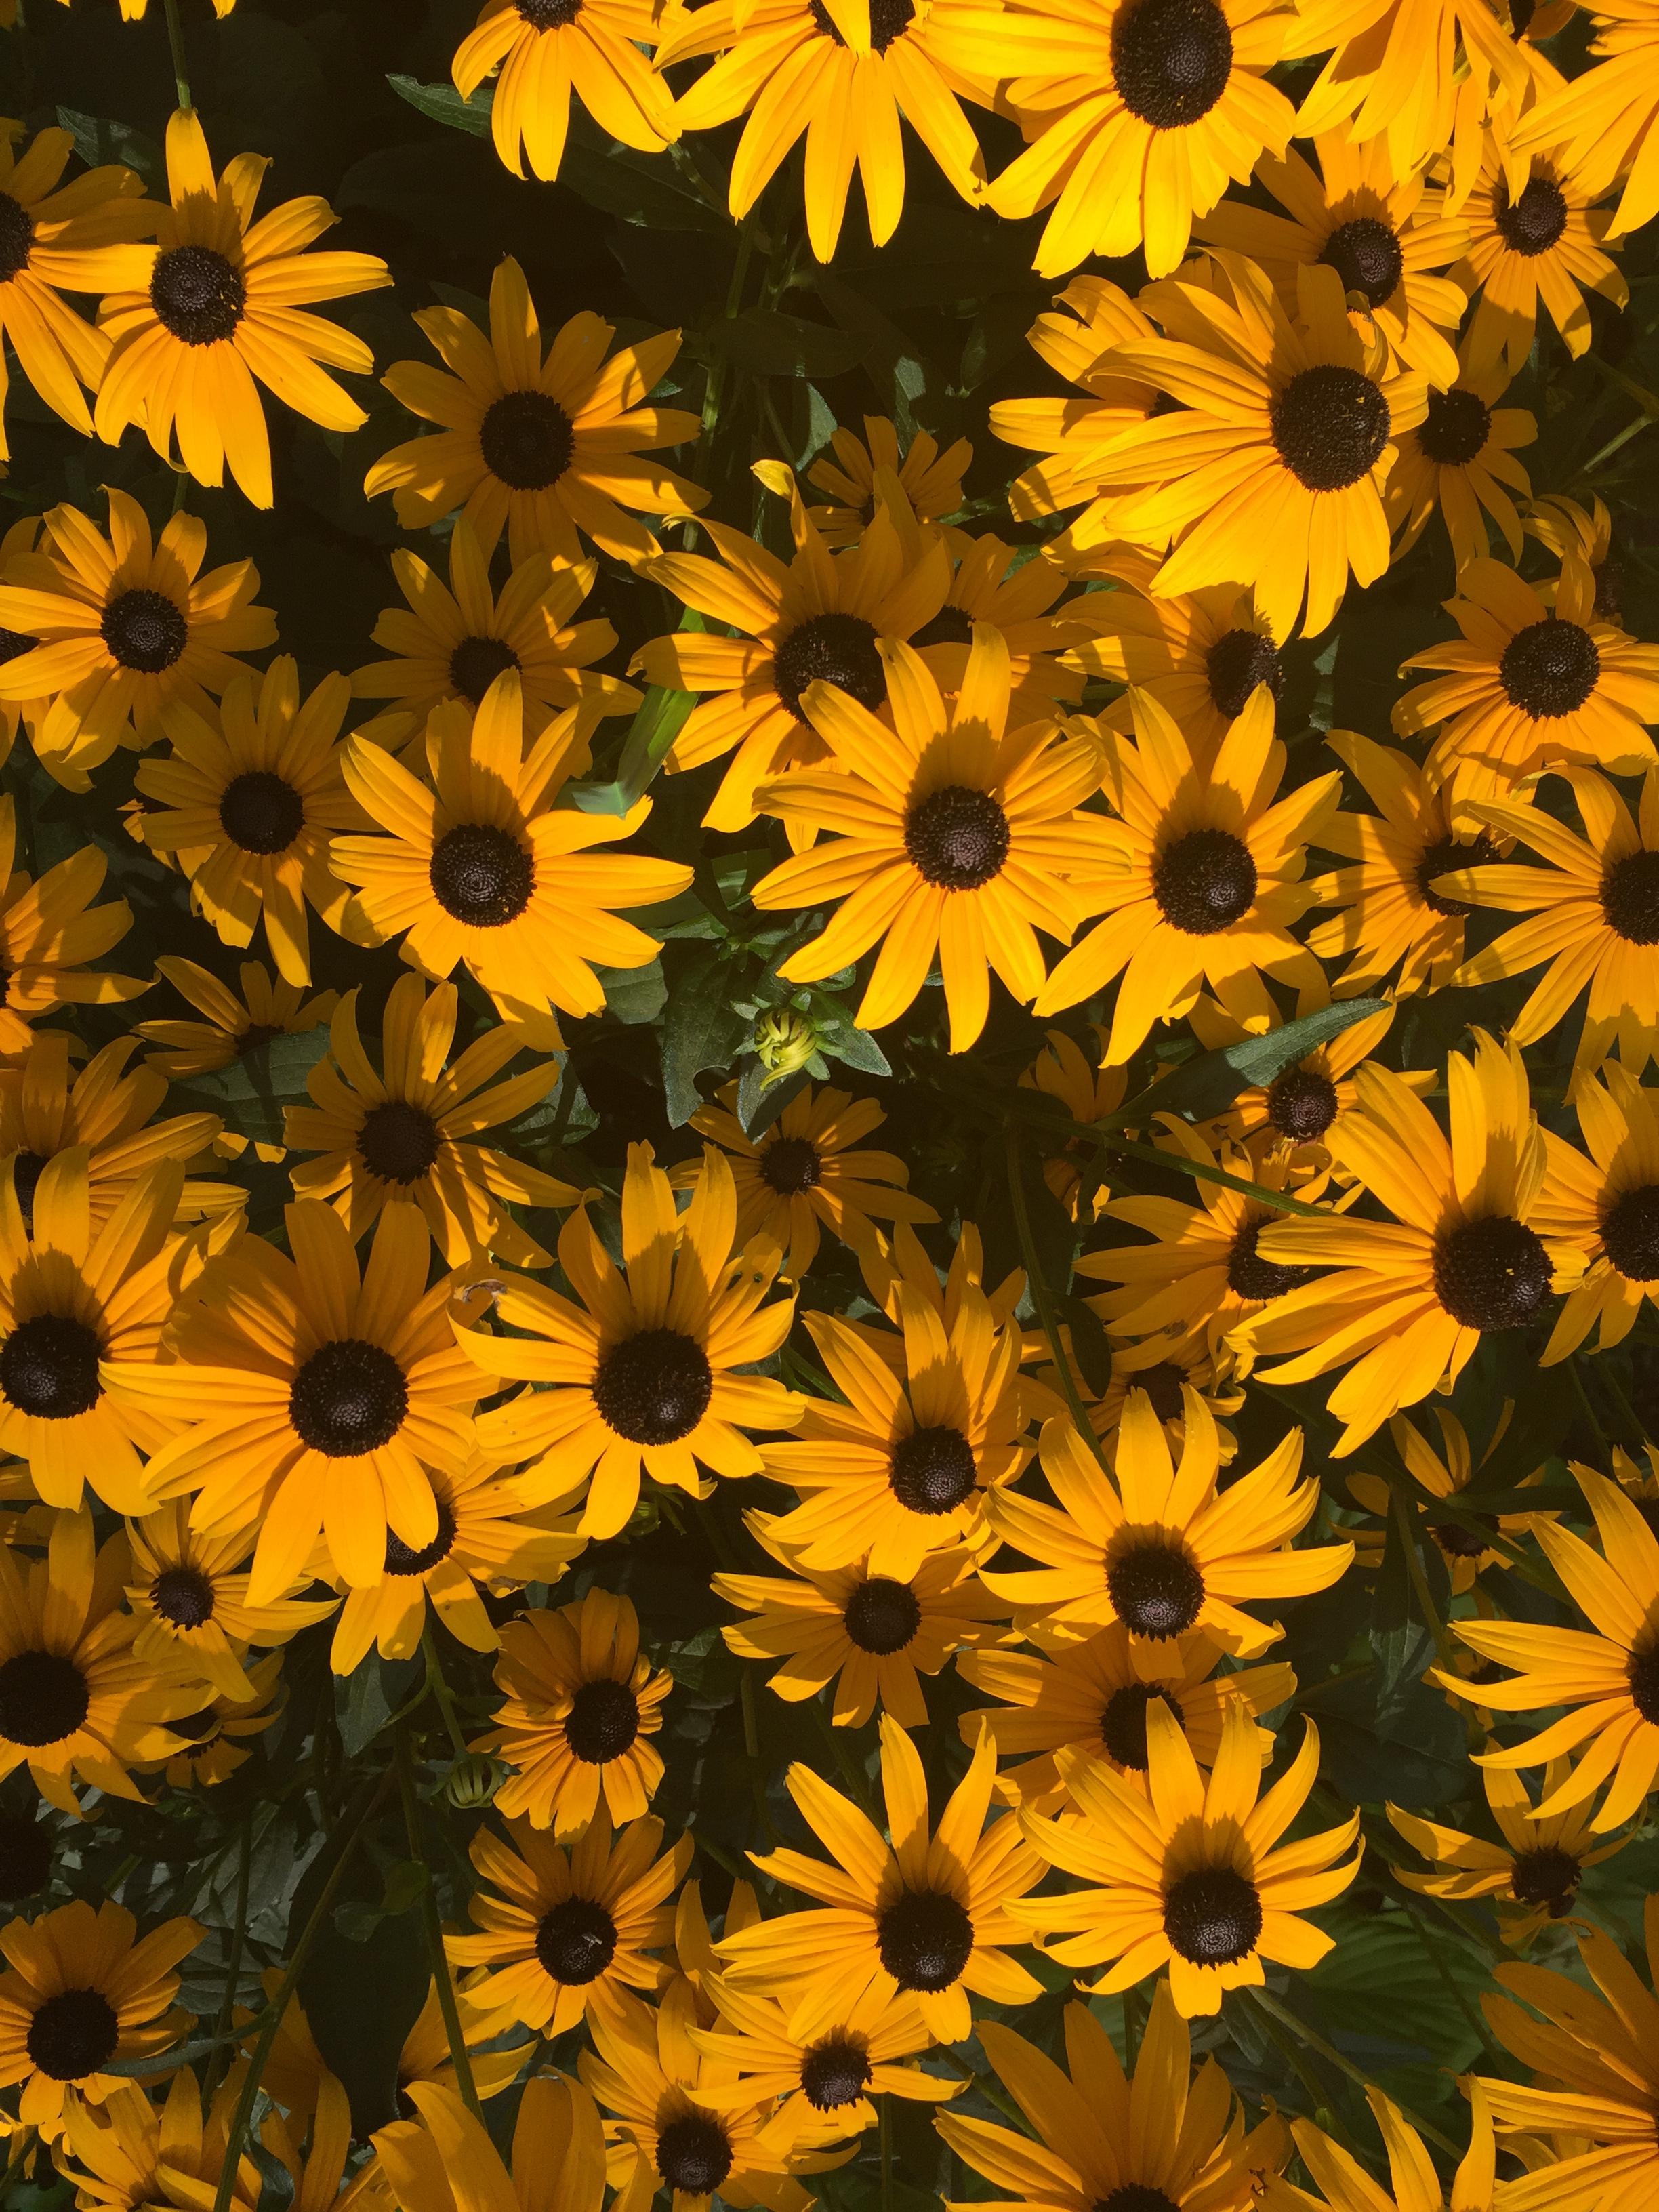 Gardening | Gardening from a Hammock